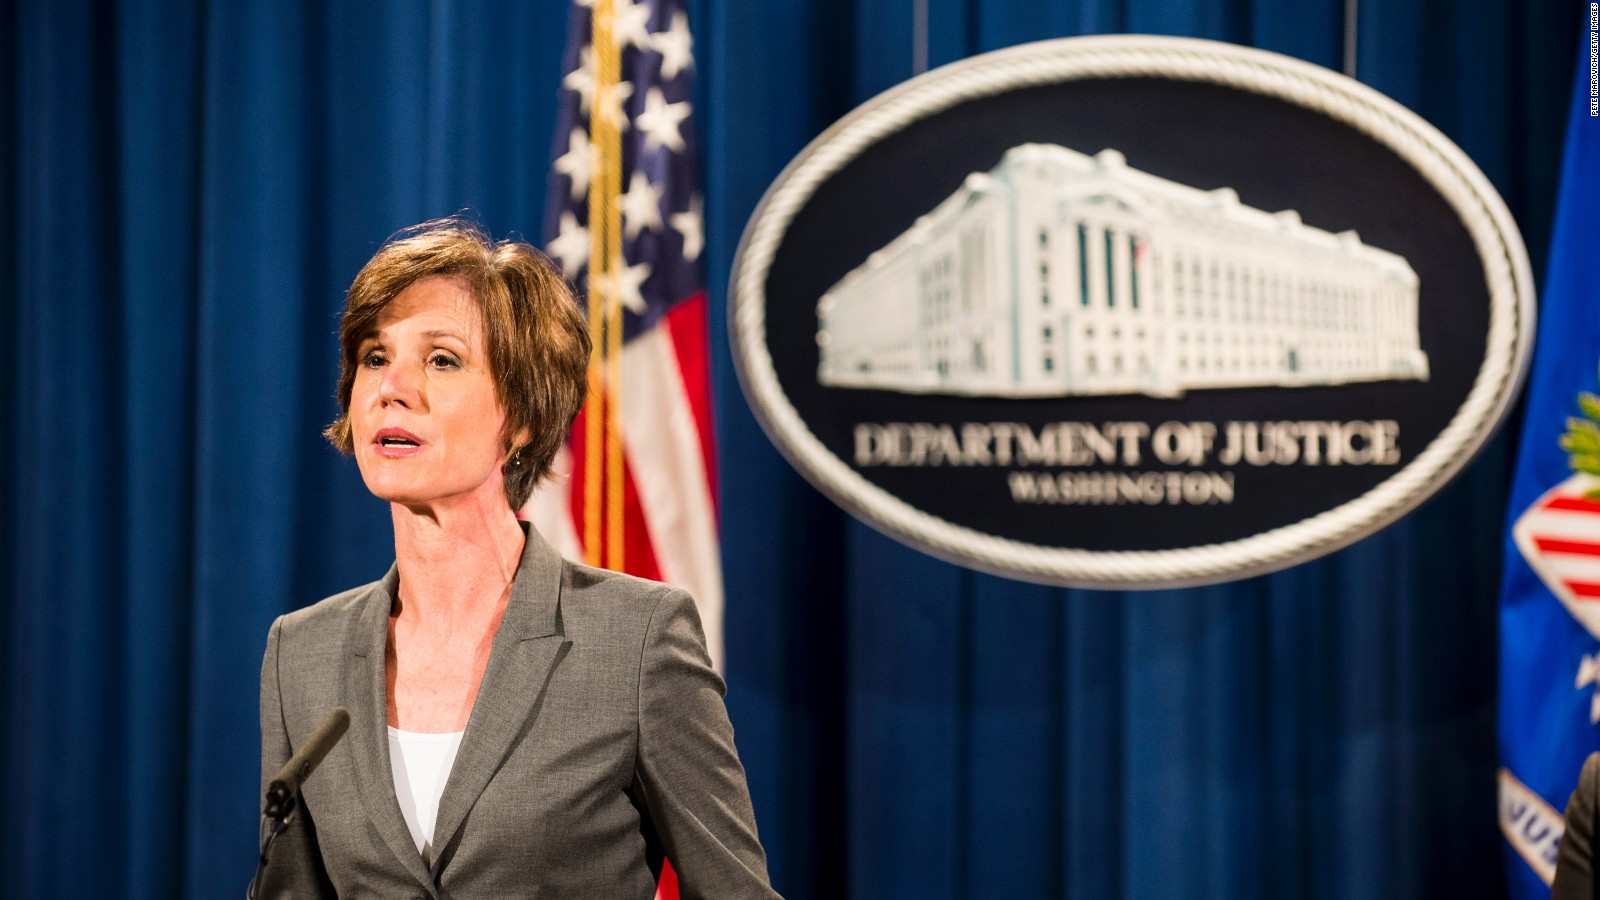 us attorney job description the justice department